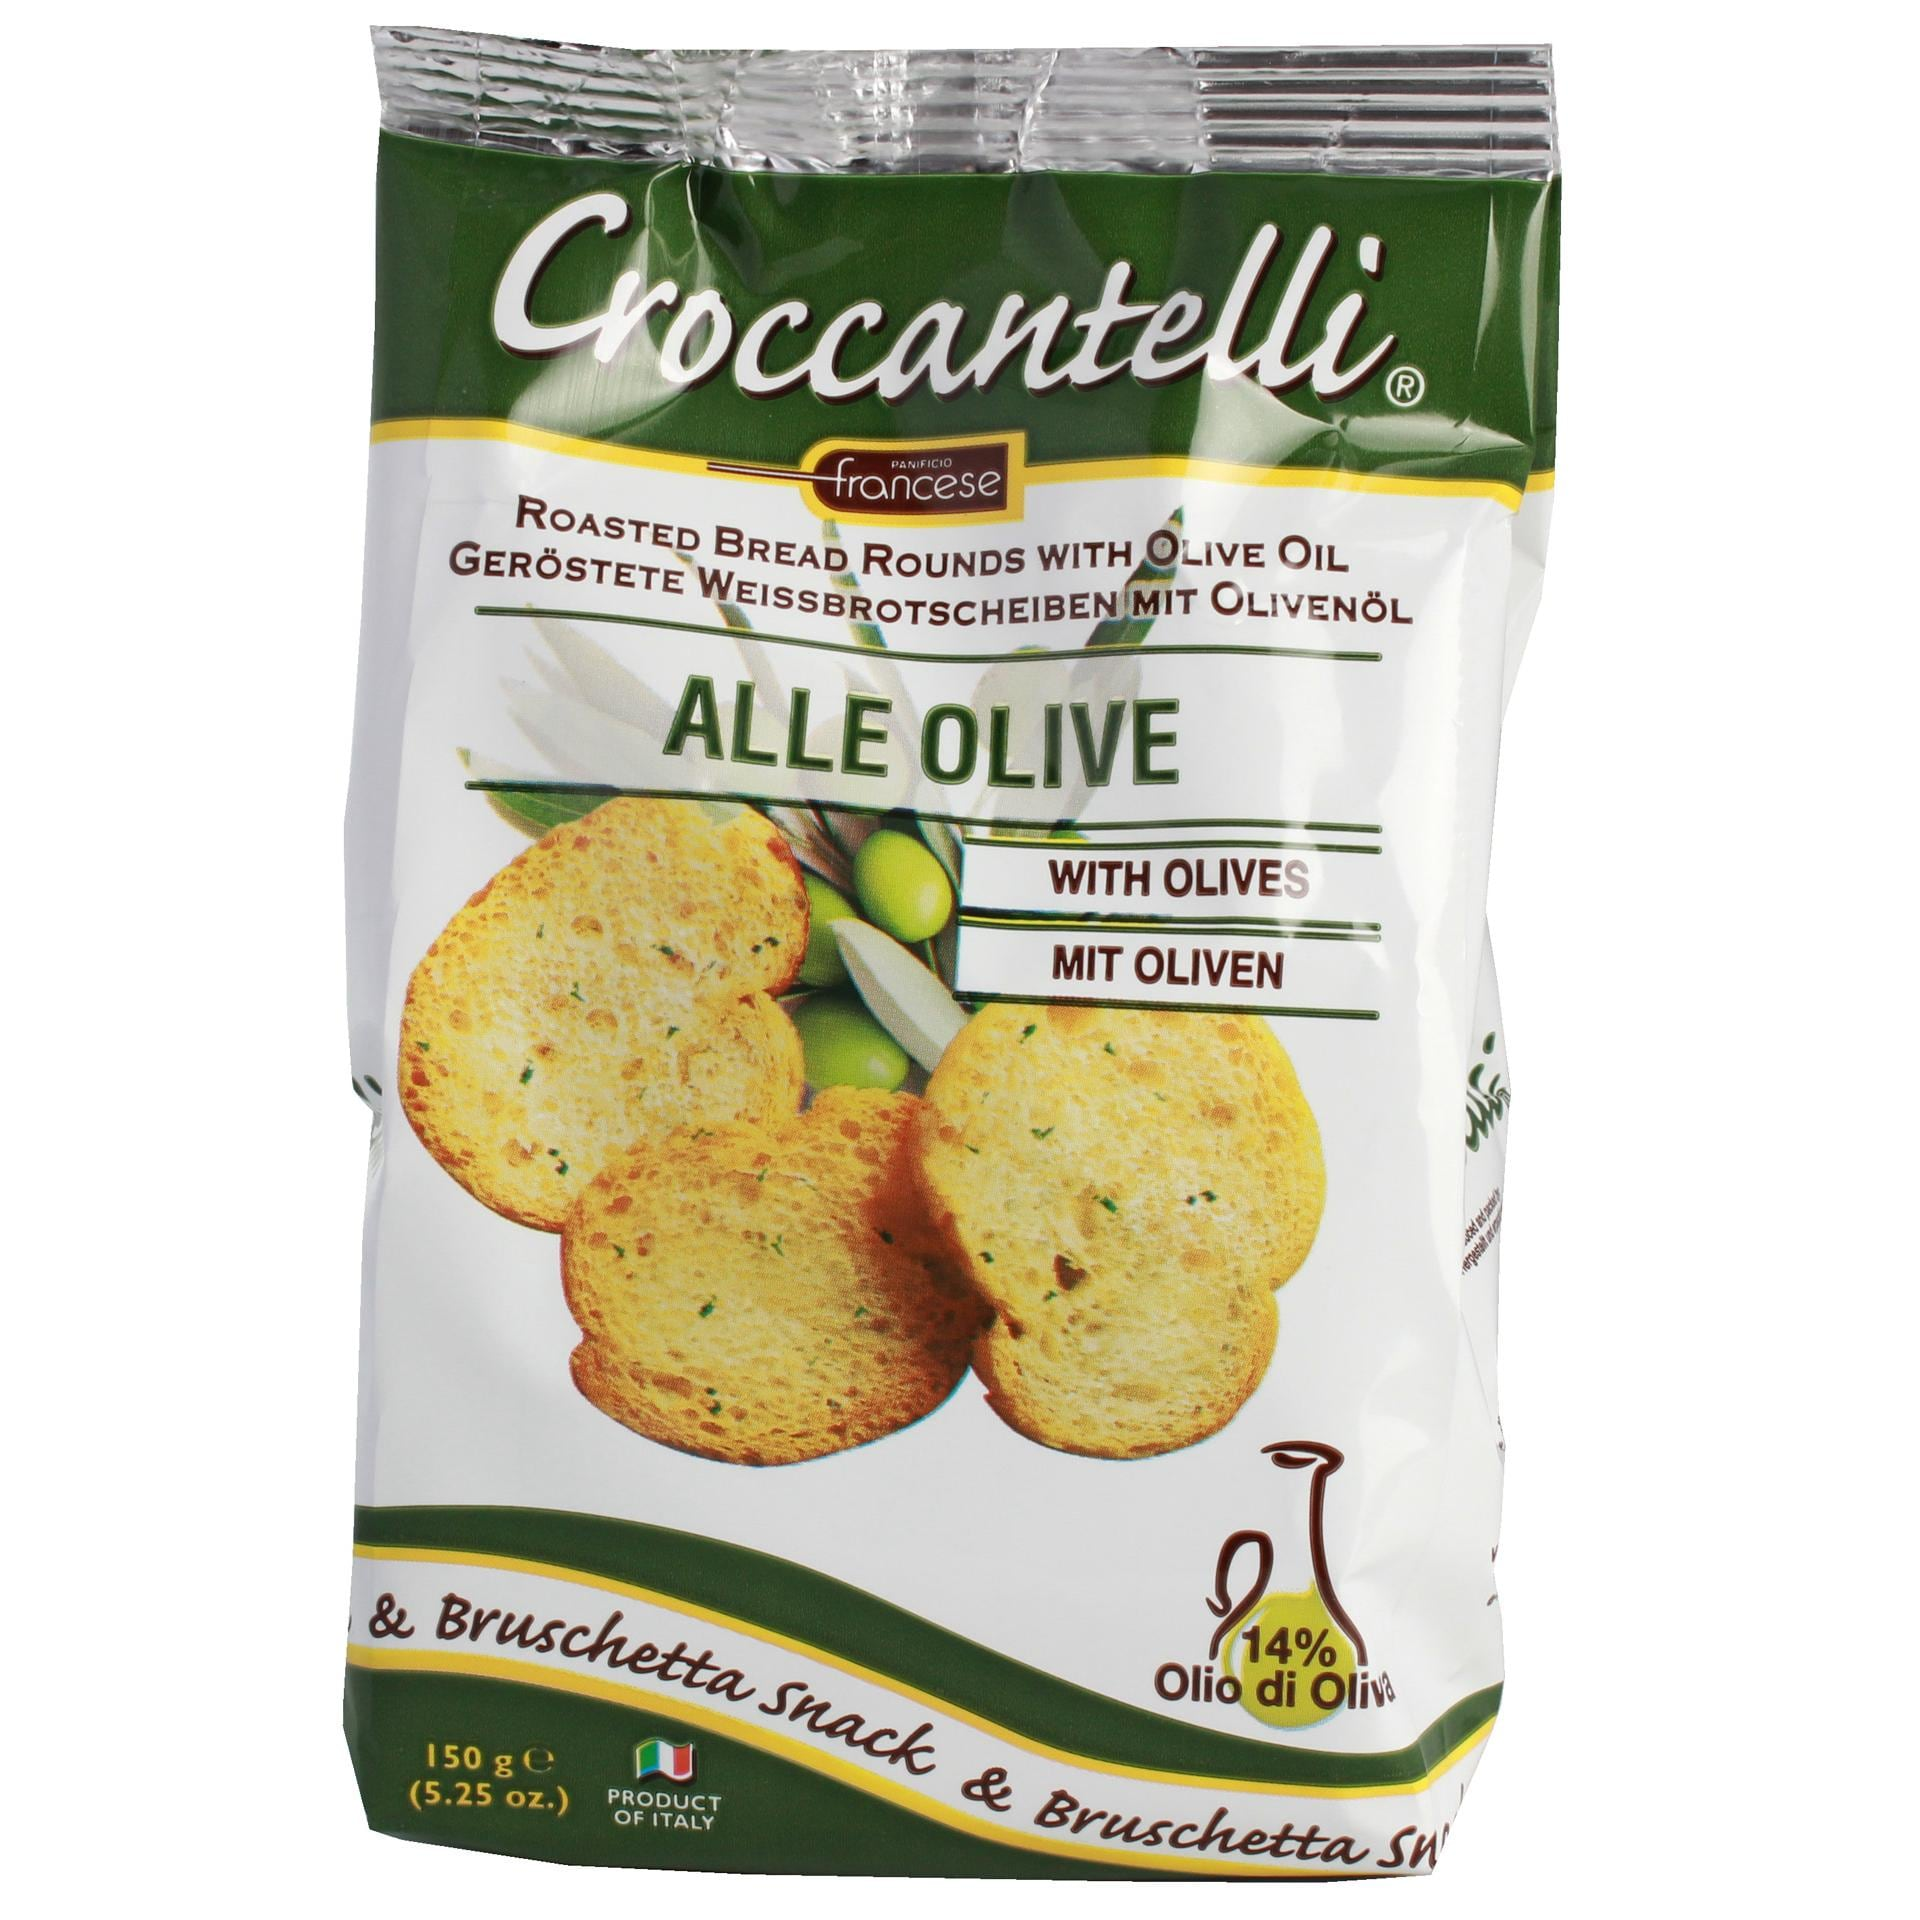 Croccantelli - geröstete Weißbrotscheiben mit Olivenöl Italien Topping Salat Snack Knabberei - 150g